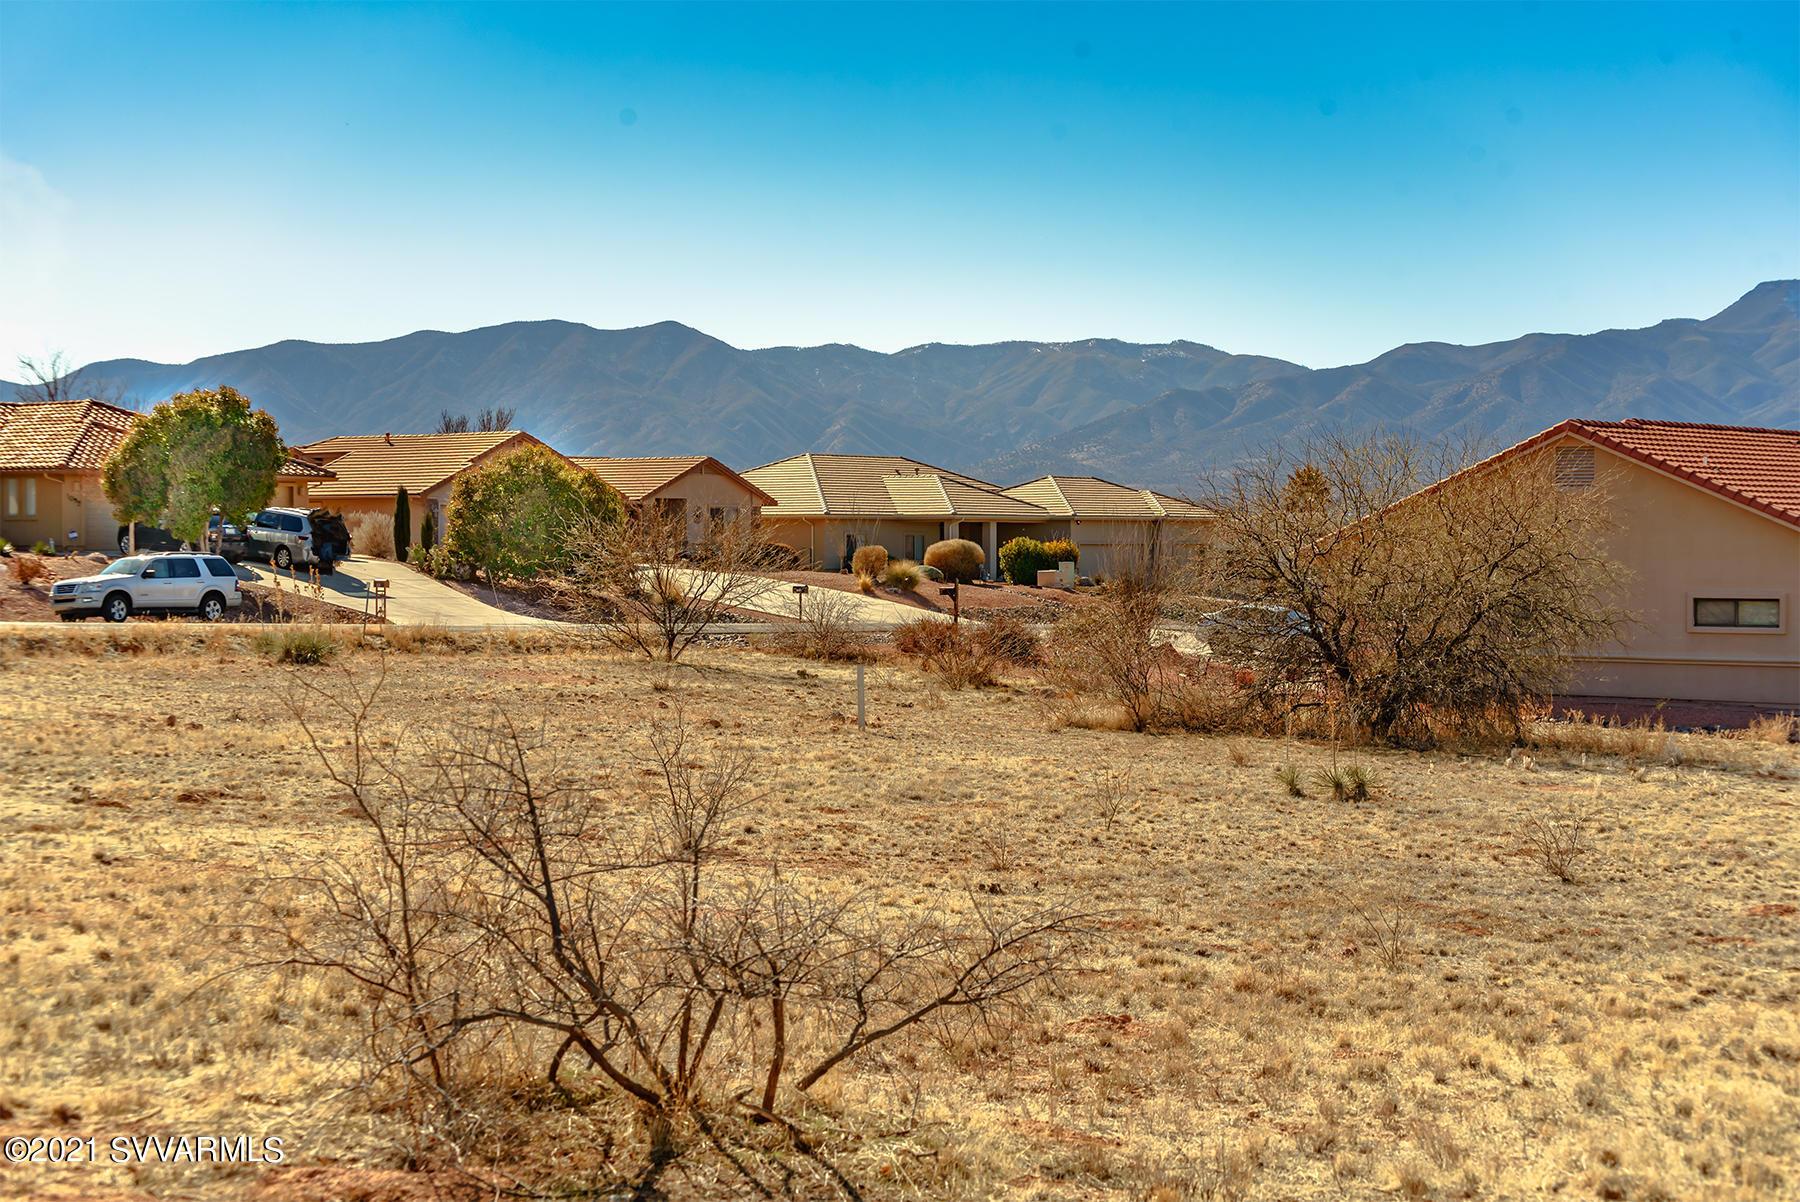 1095 S Verde Santa Fe Pkwy Cornville, AZ 86325